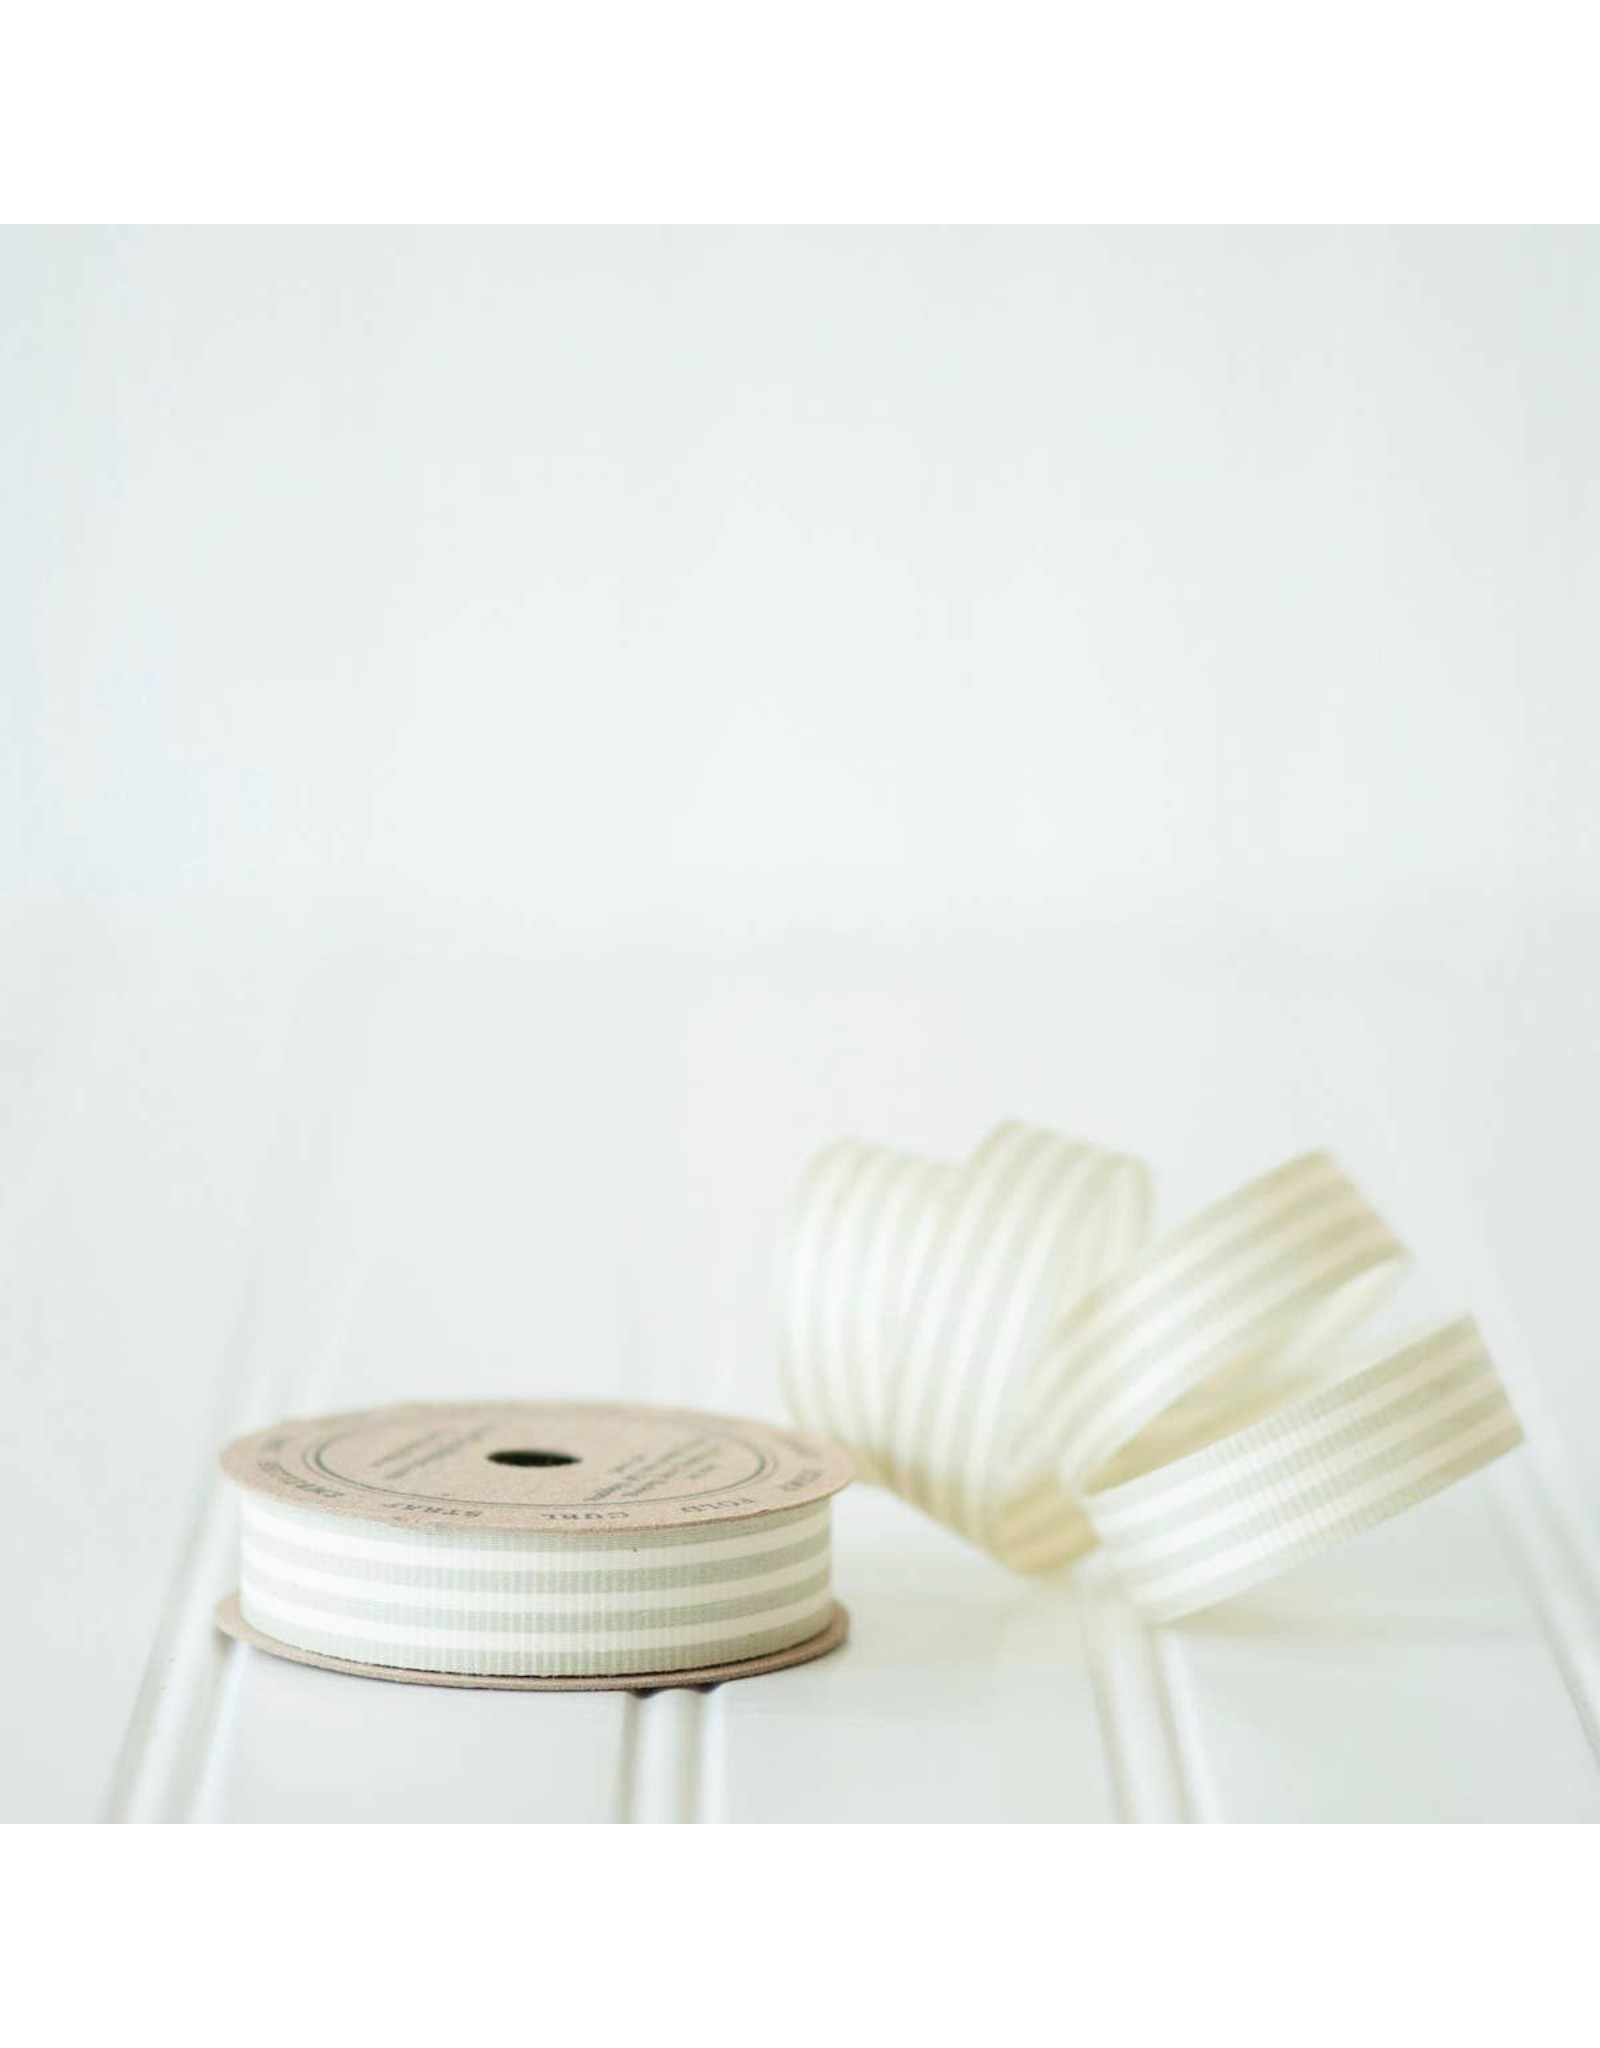 Ribbon - Grey & Cream Stripe